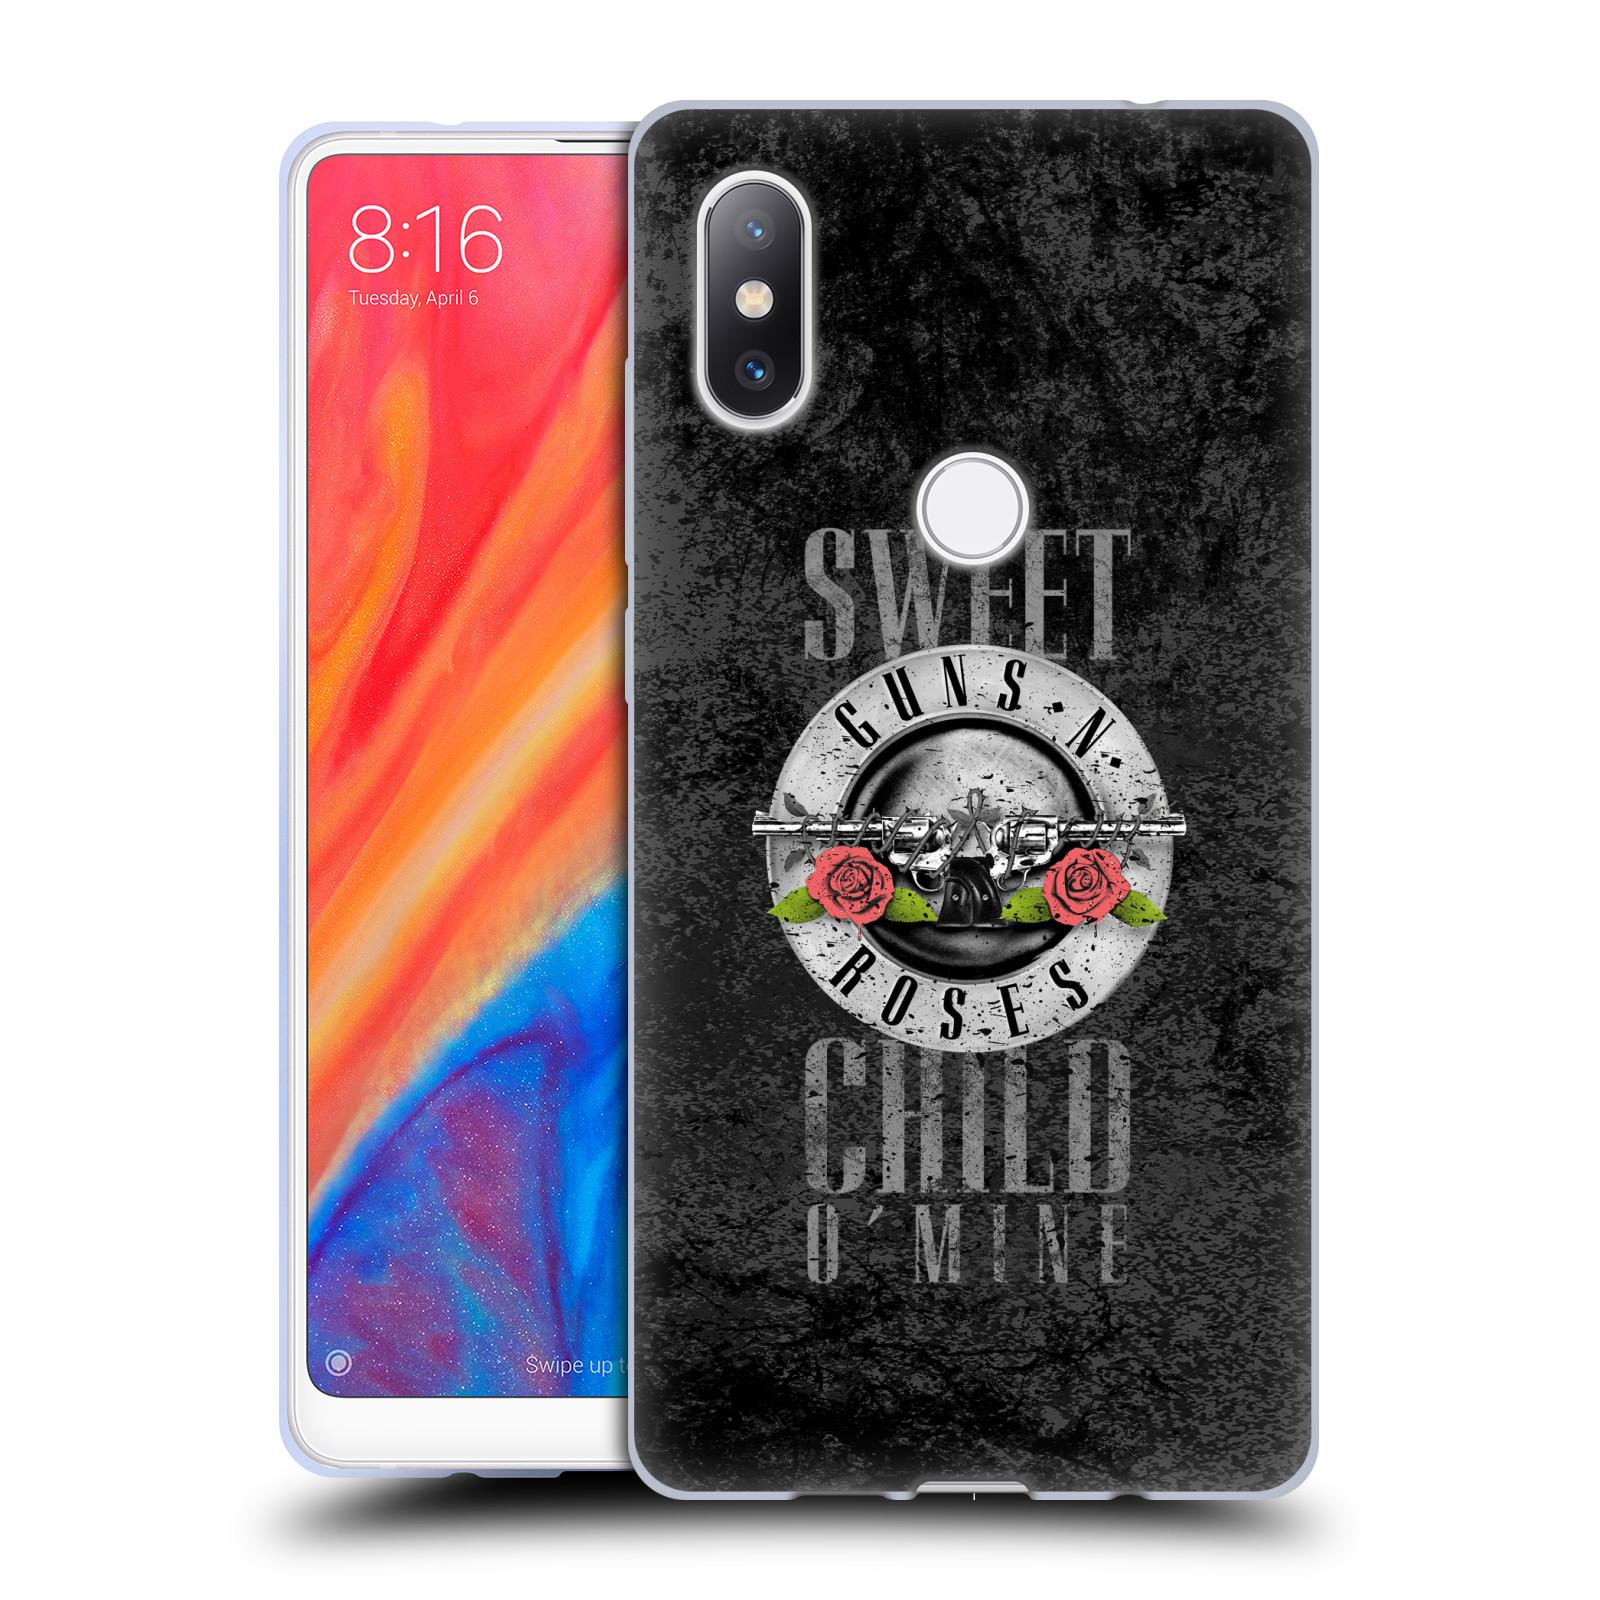 Silikonové pouzdro na mobil Xiaomi Mi Mix 2S - Head Case - Guns N' Roses - Sweet Child